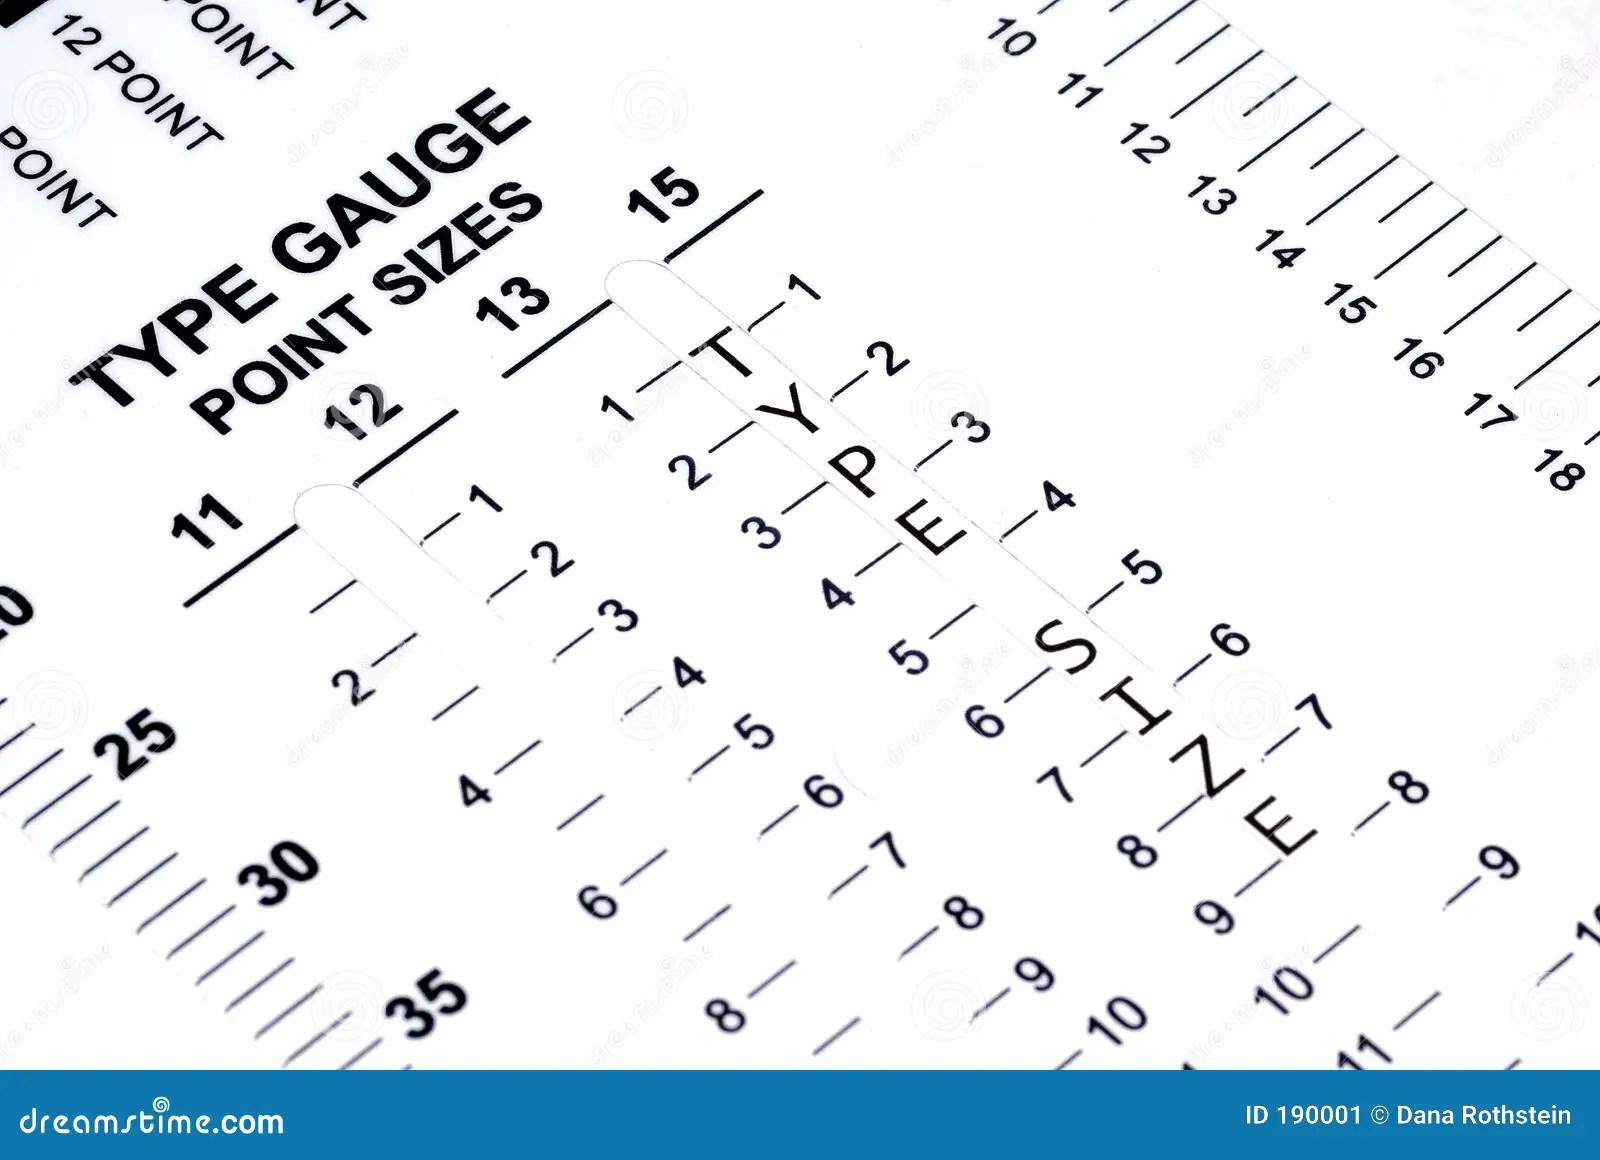 Type Gauge Stock Image